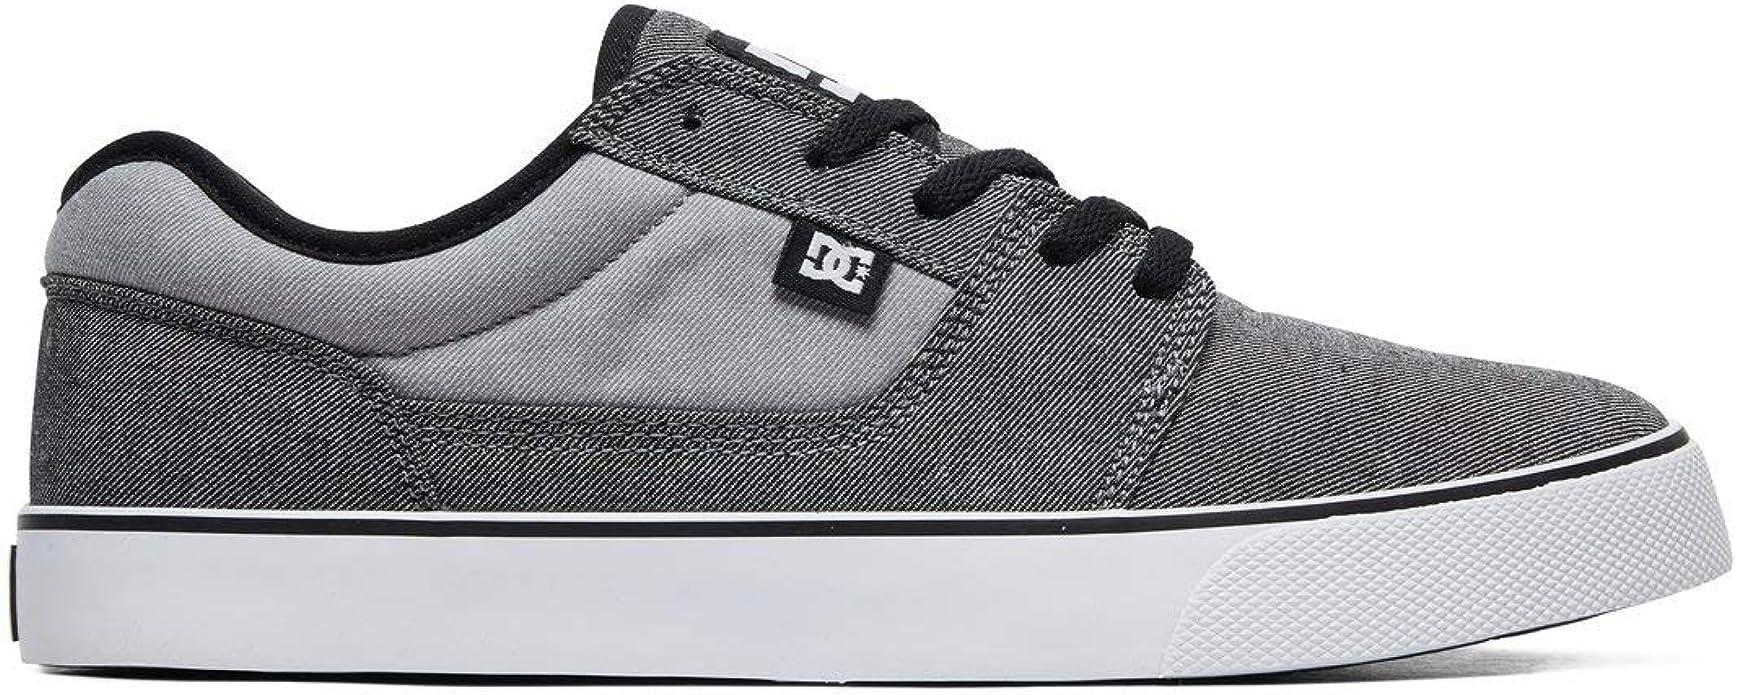 DC Shoes Tonik TX SE Sneakers Skateschuhe Herren Grau/Schwarz